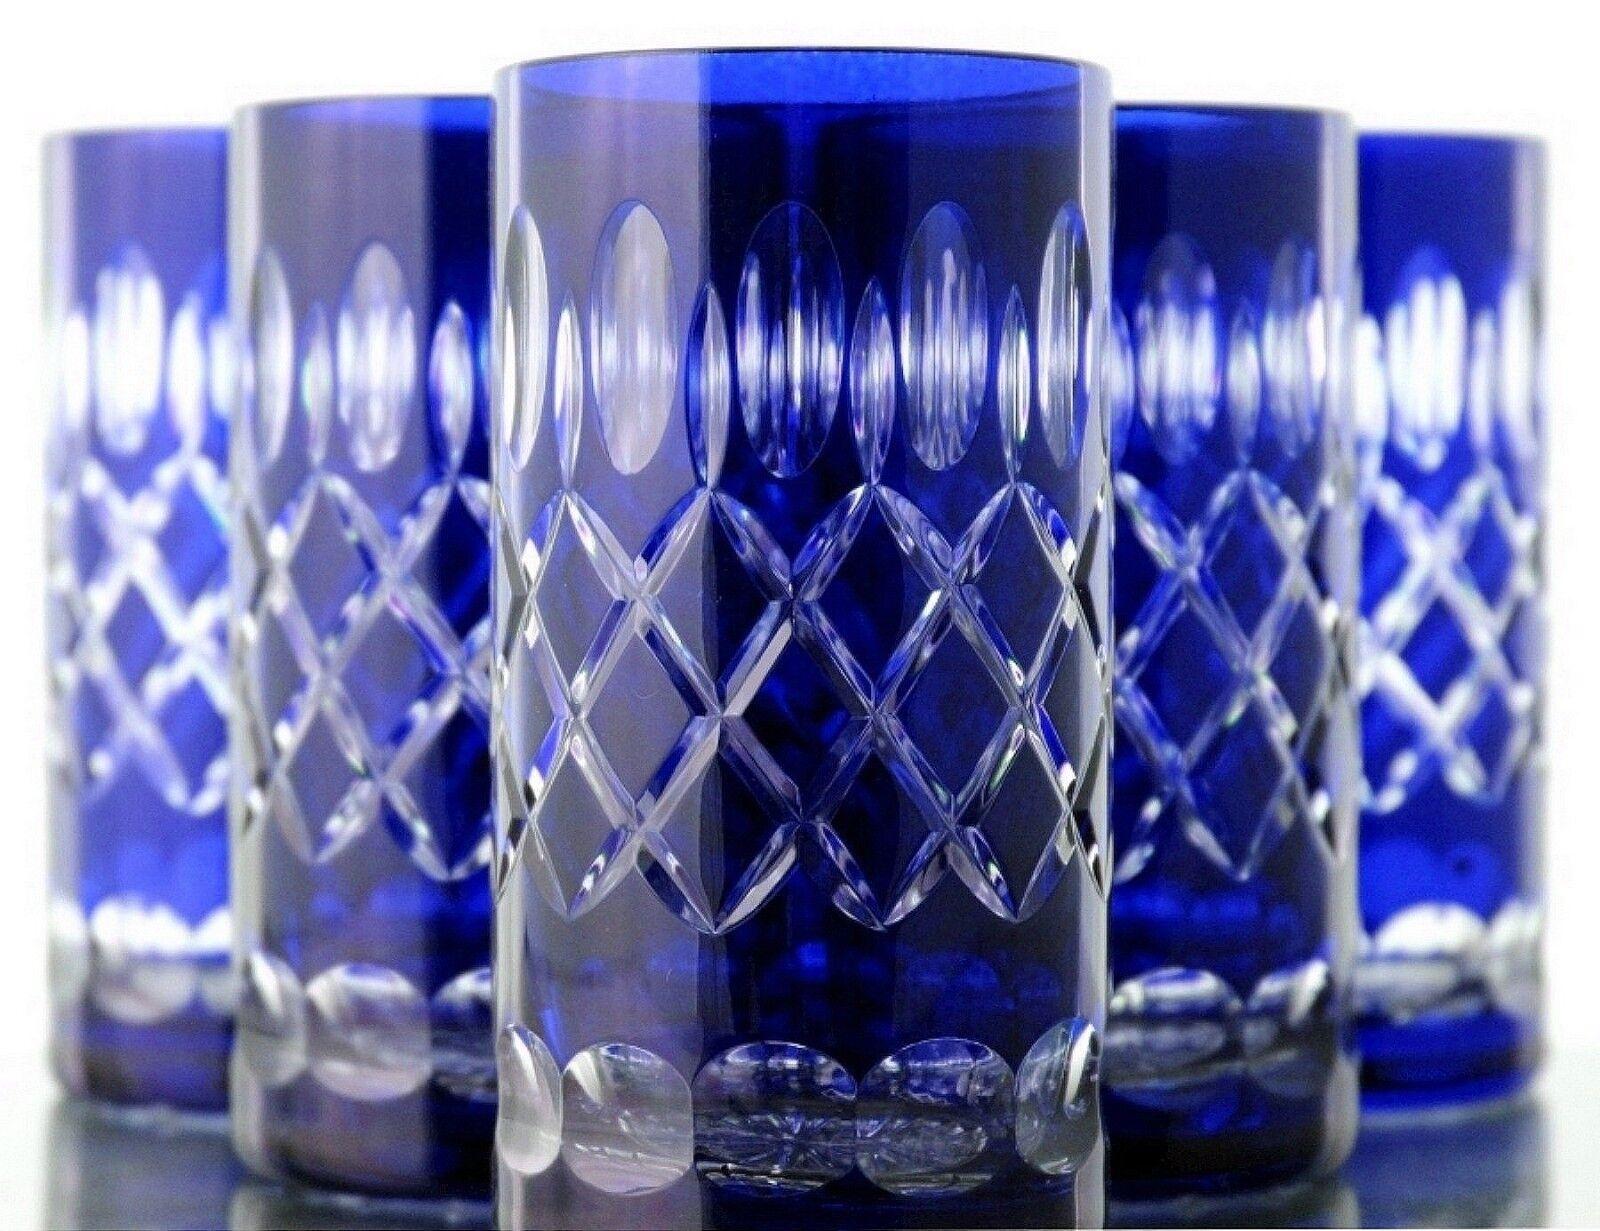 Longdrink Verres romains bleikristall 6 St. (283 B) bleue potable Verres bleikristall